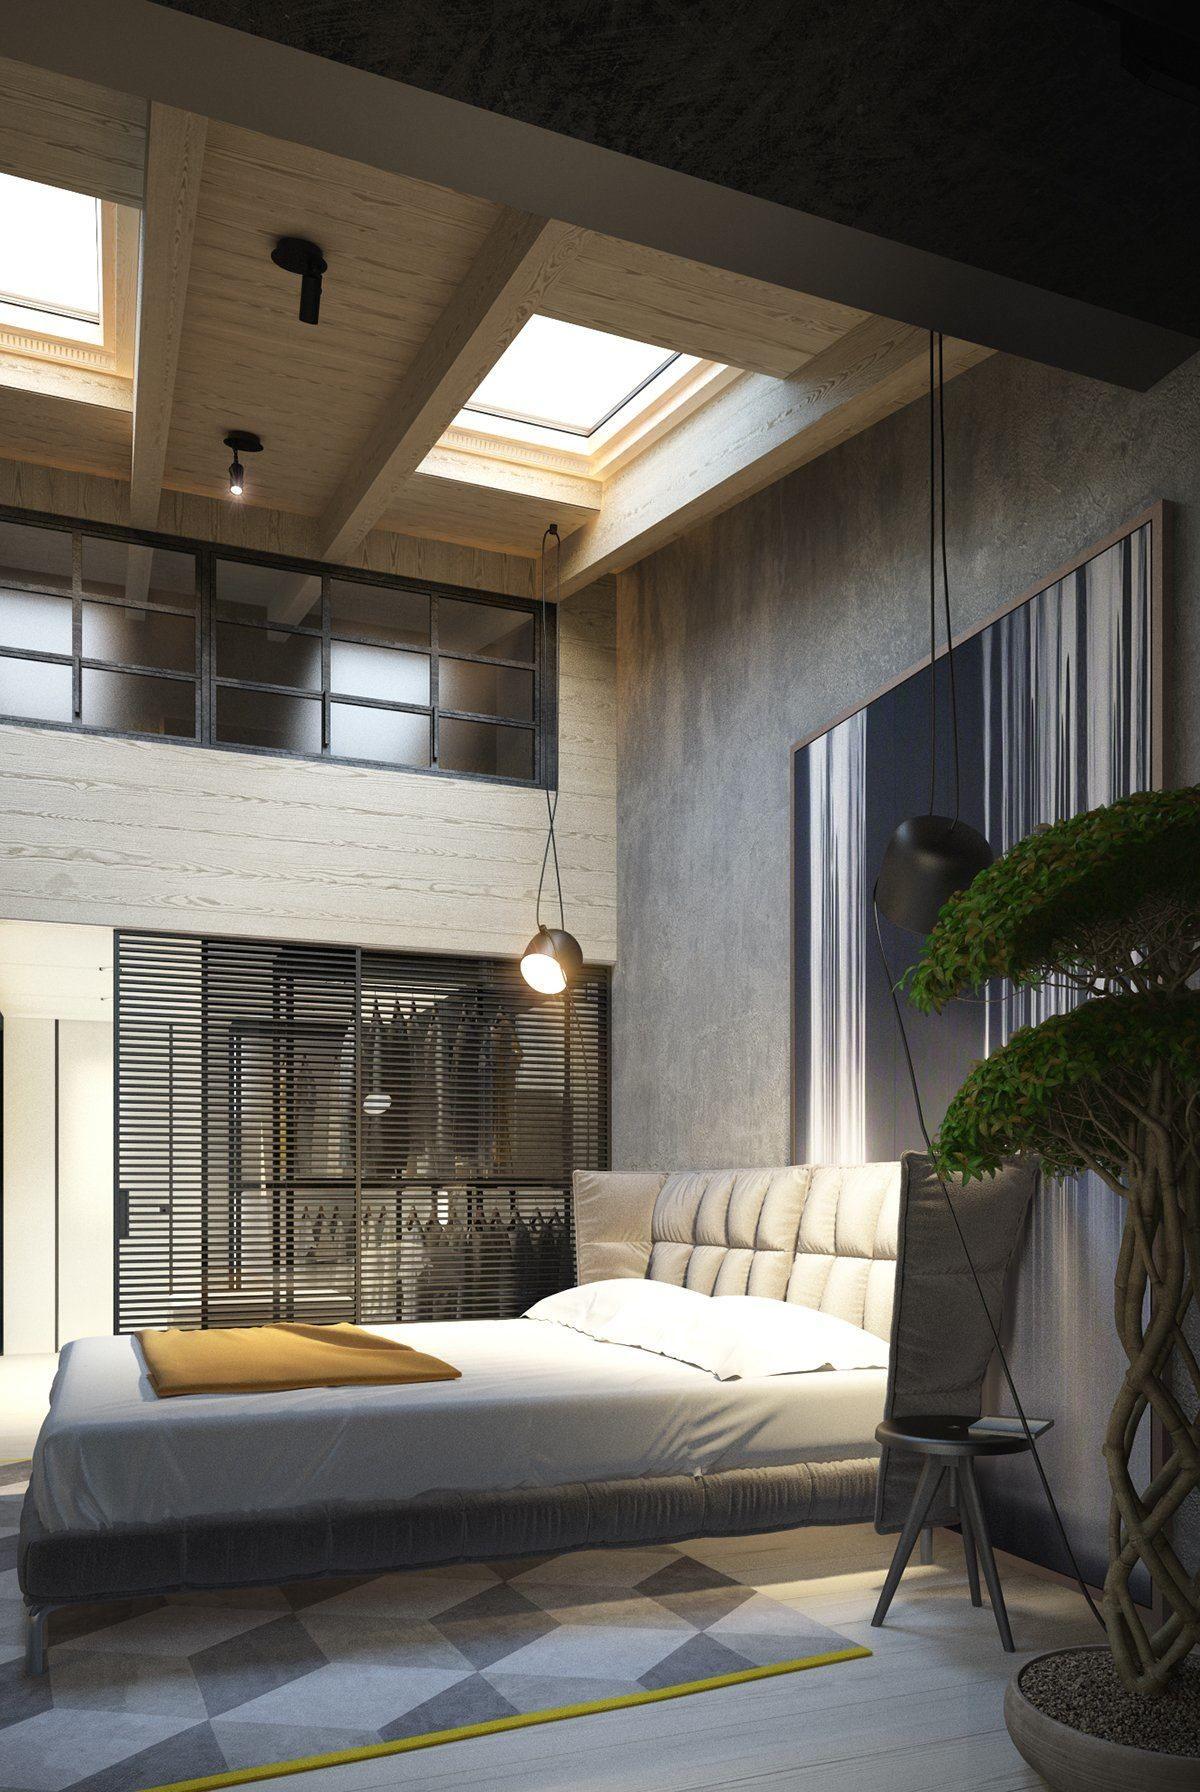 Exposed Concrete Walls Ideas Inspiration Loft Style Bedroom Concrete Interiors Bedroom Design